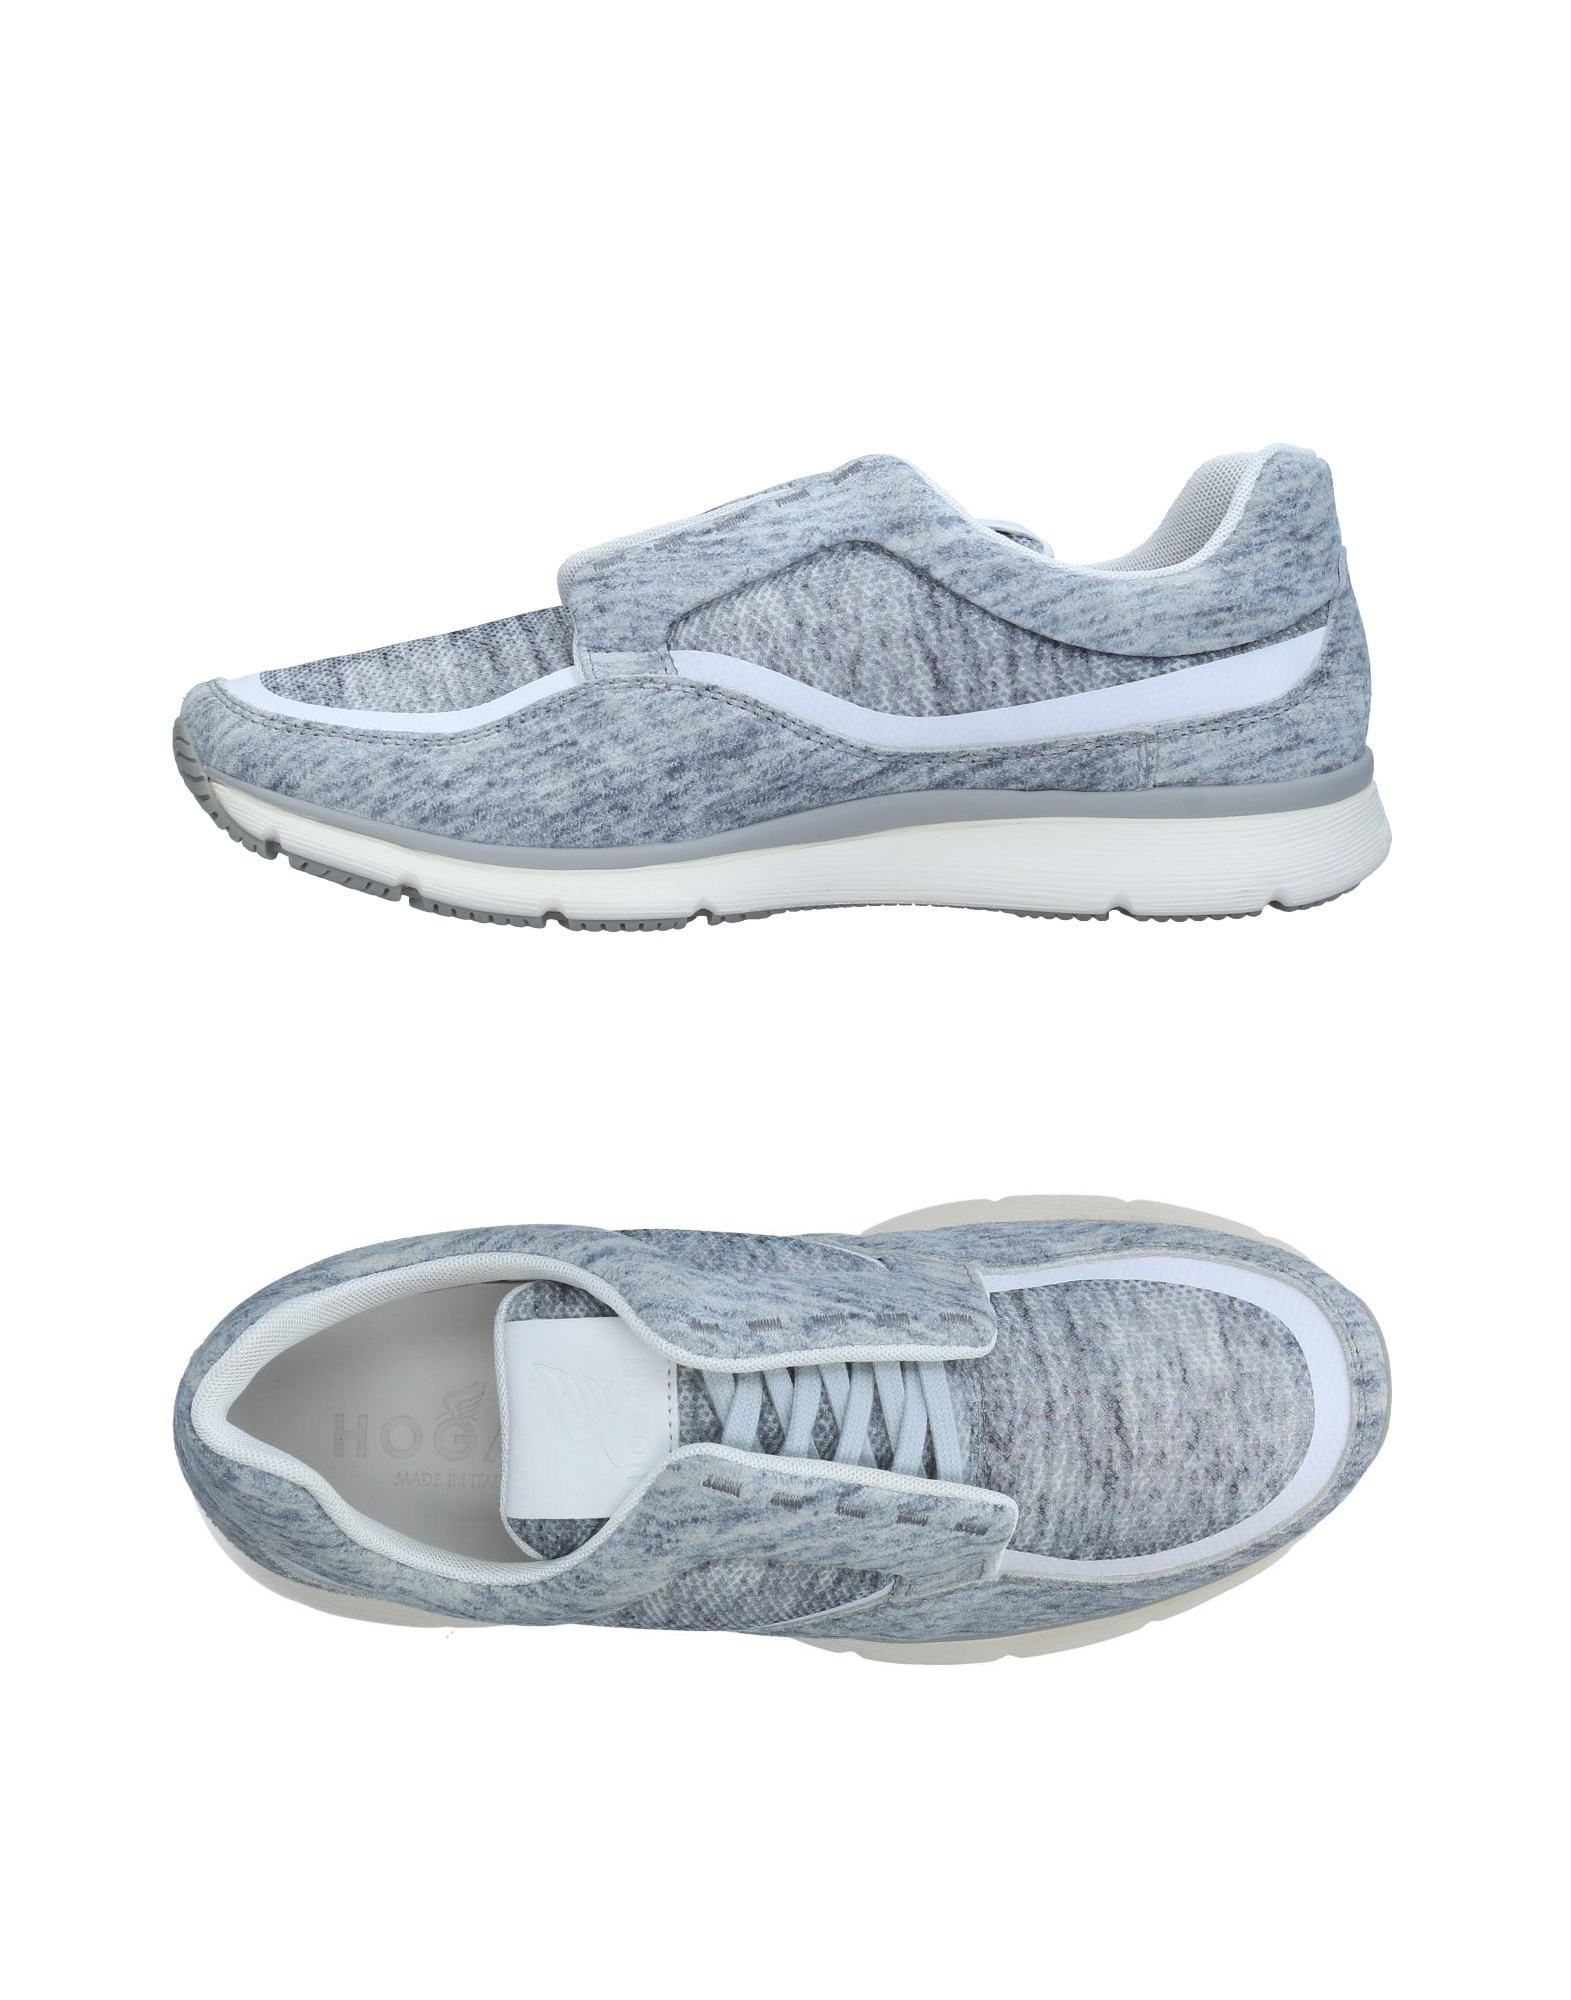 Hogan Sneakers Herren  11335738QI Gute Qualität beliebte Schuhe